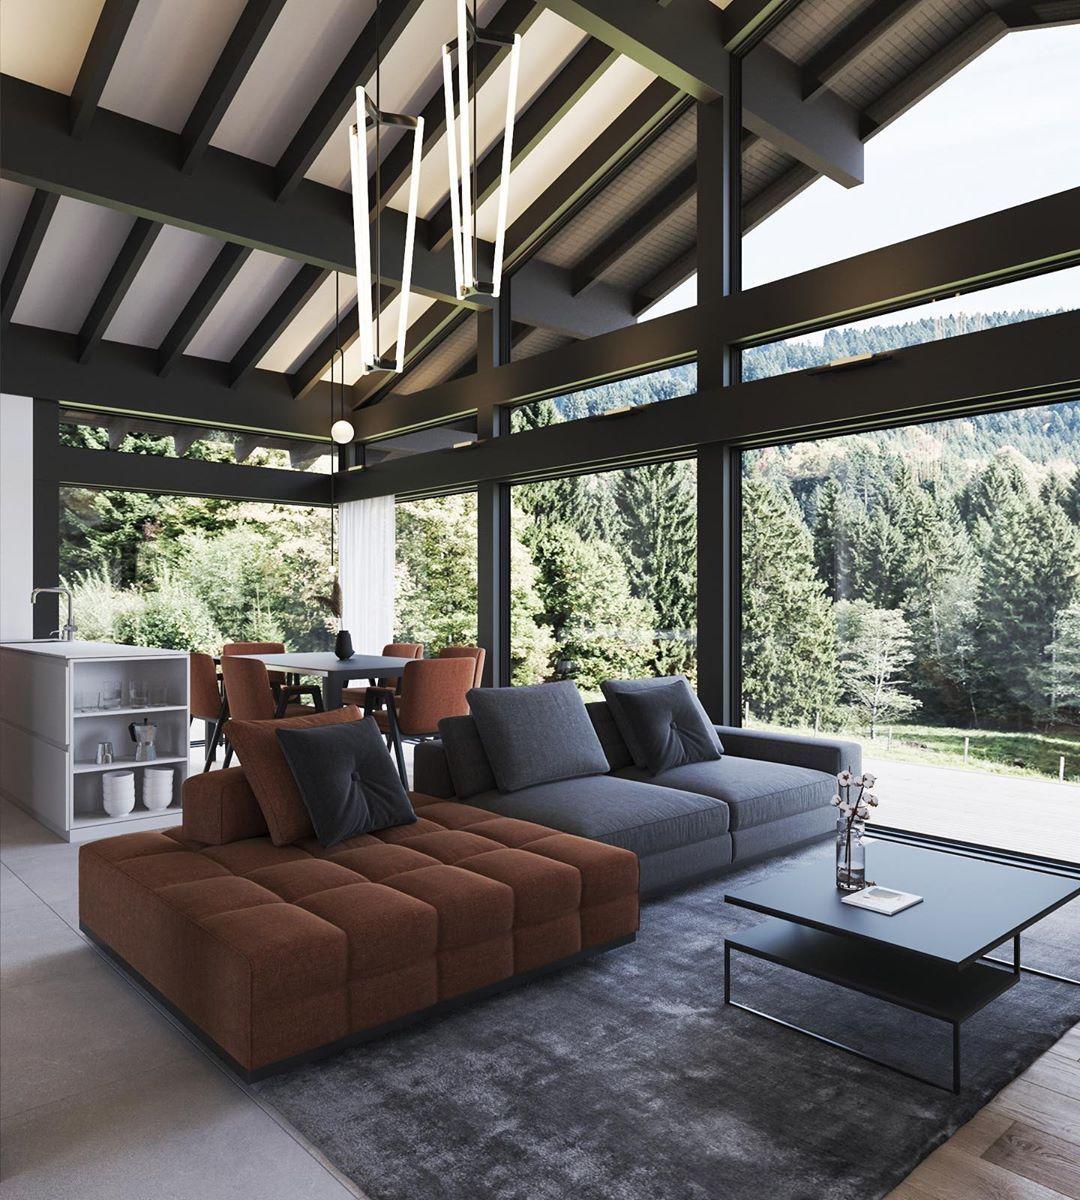 Design Only On Instagram One 100 House By Sergey Domogatskiy Ecocomplect Company Visu Budget Home Decorating Home Interior Design Interior Design Furniture